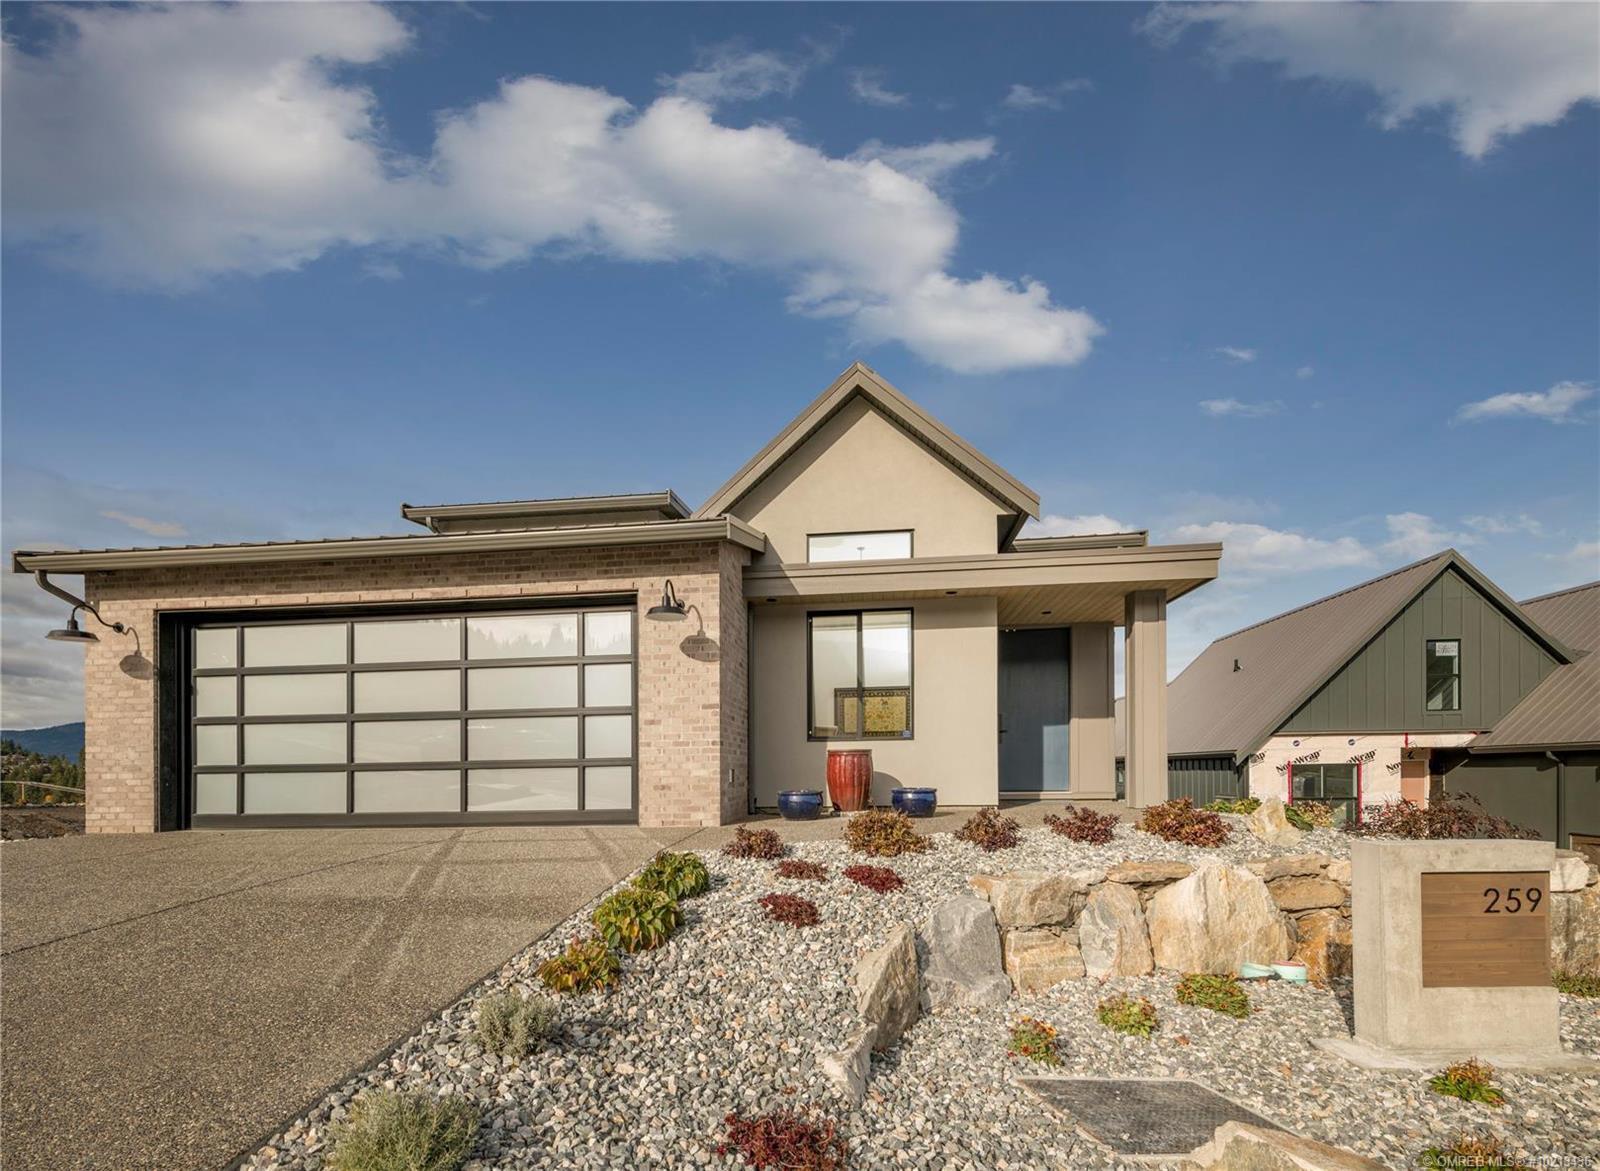 Main Photo: 259 Grange Drive, in Vernon: House for sale : MLS®# 10213436